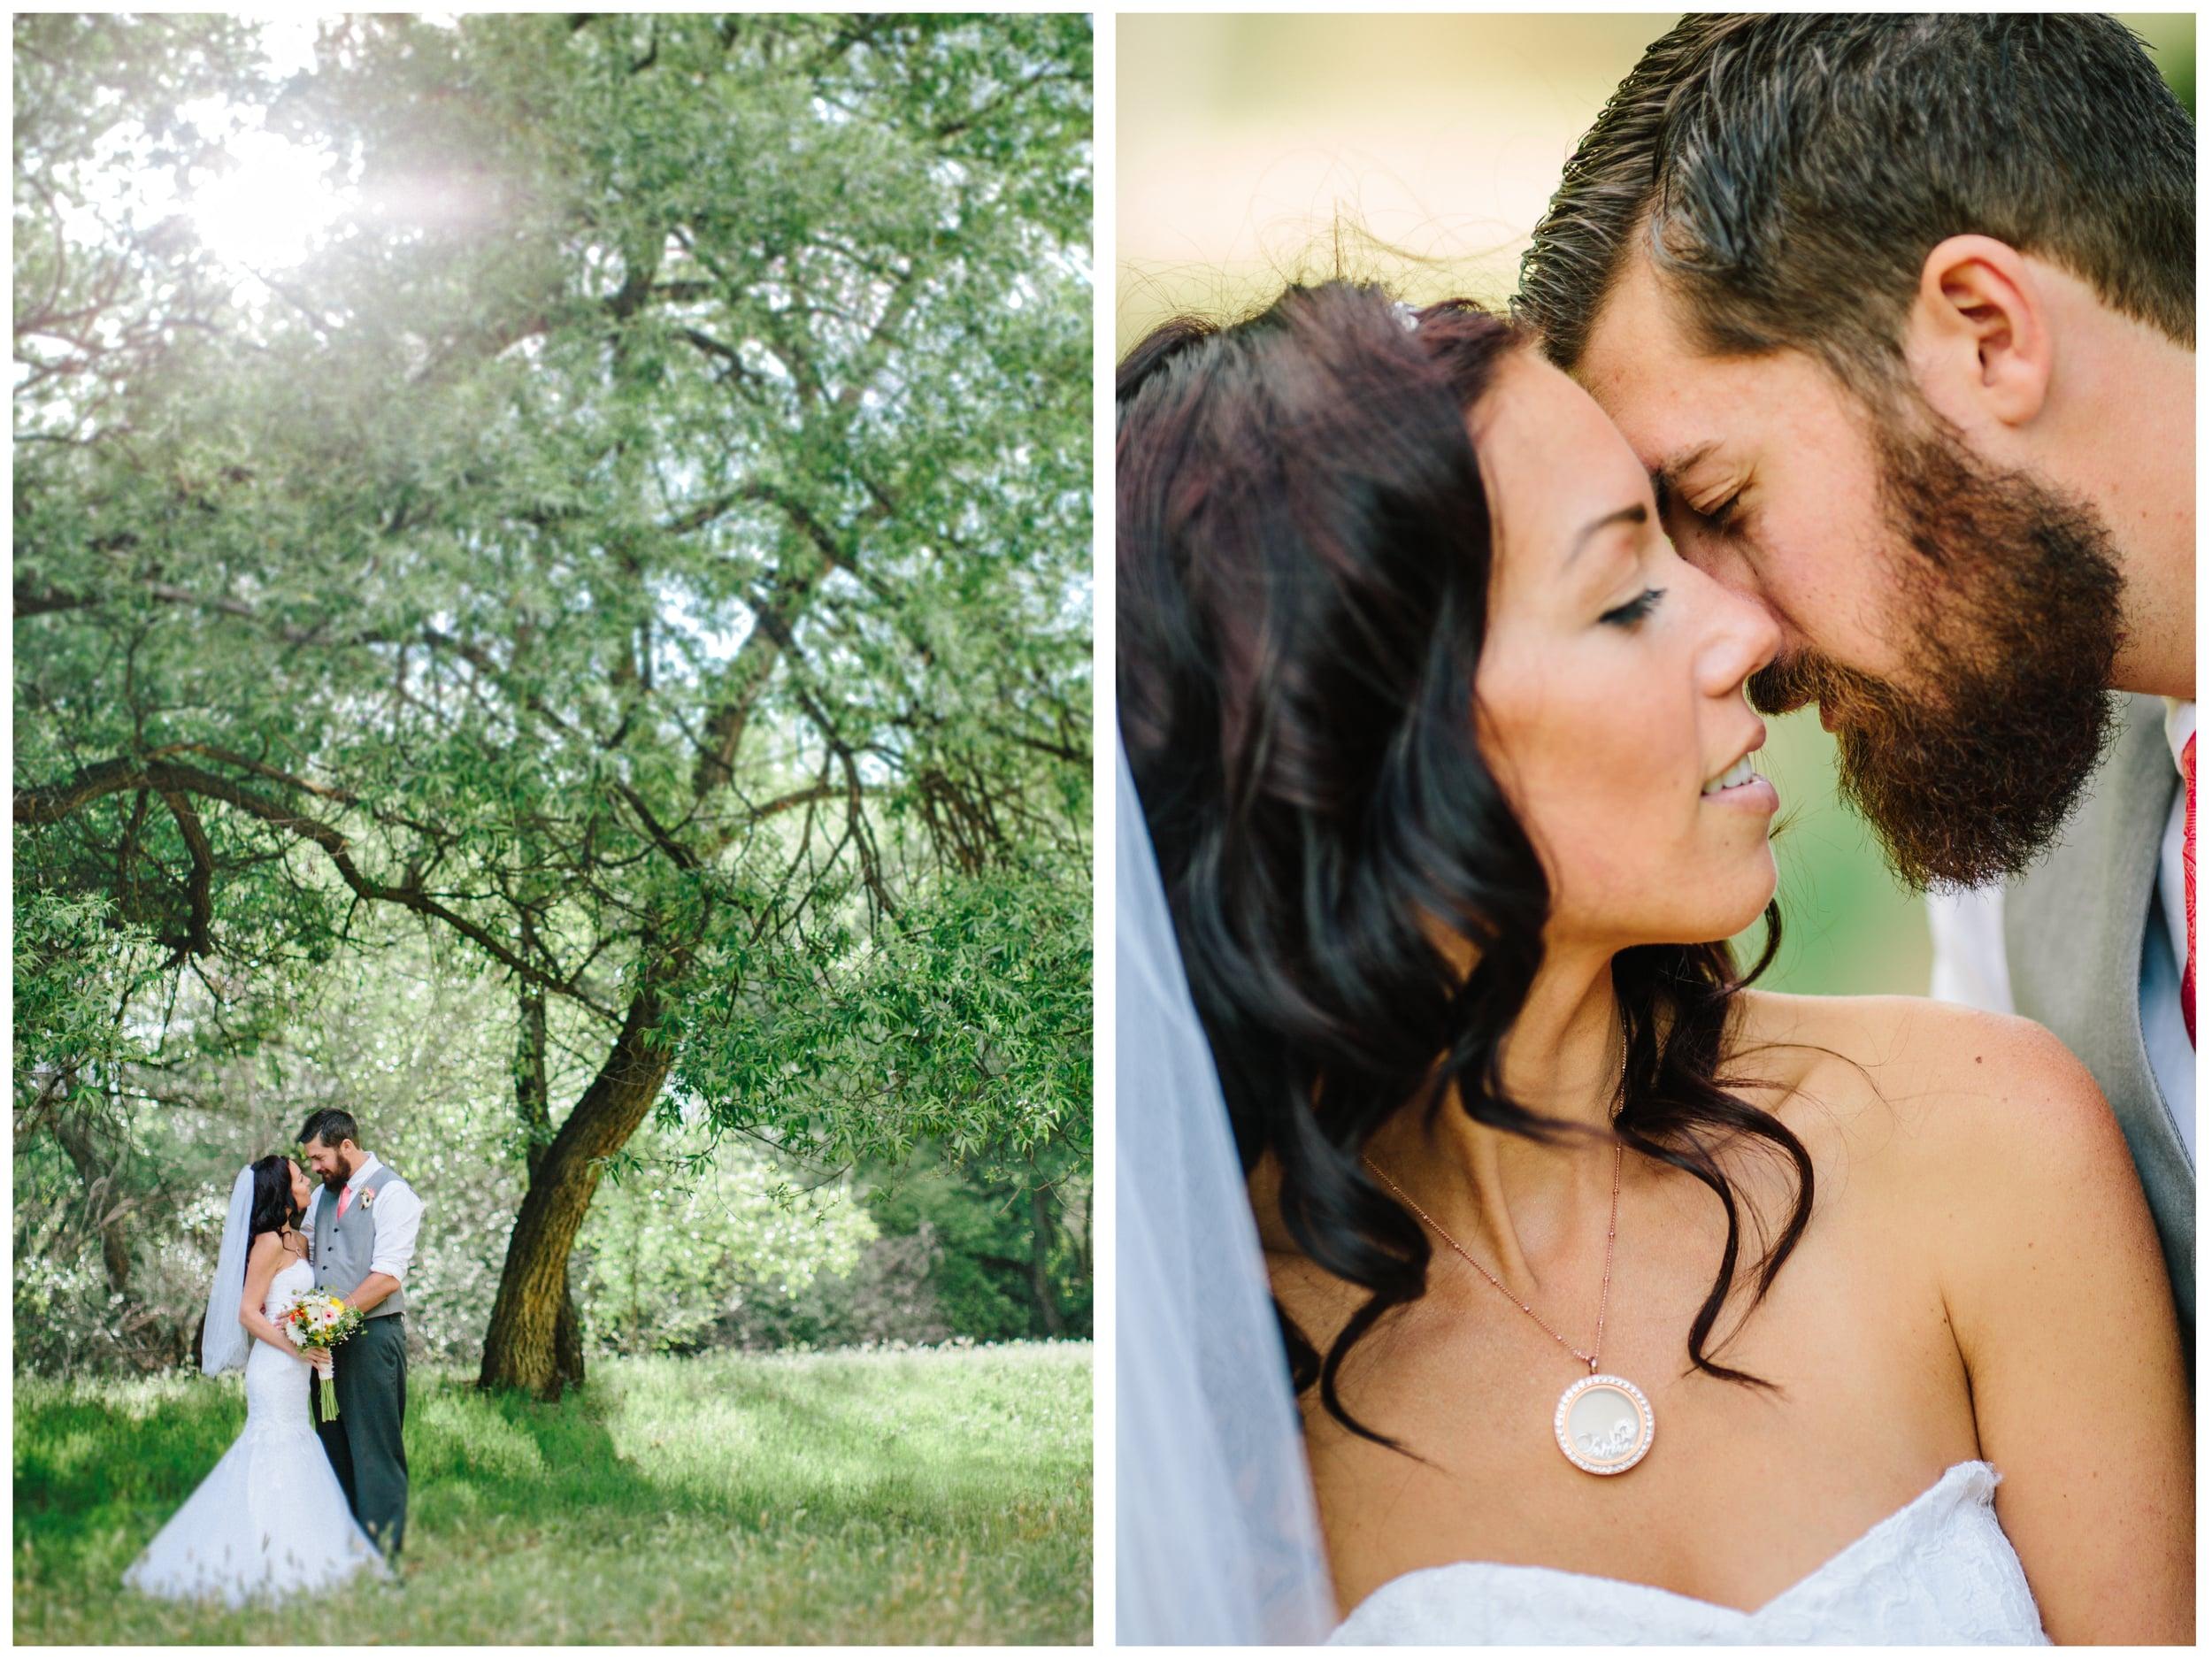 Prescott-Wedding-Photographer-Dip-5.jpg